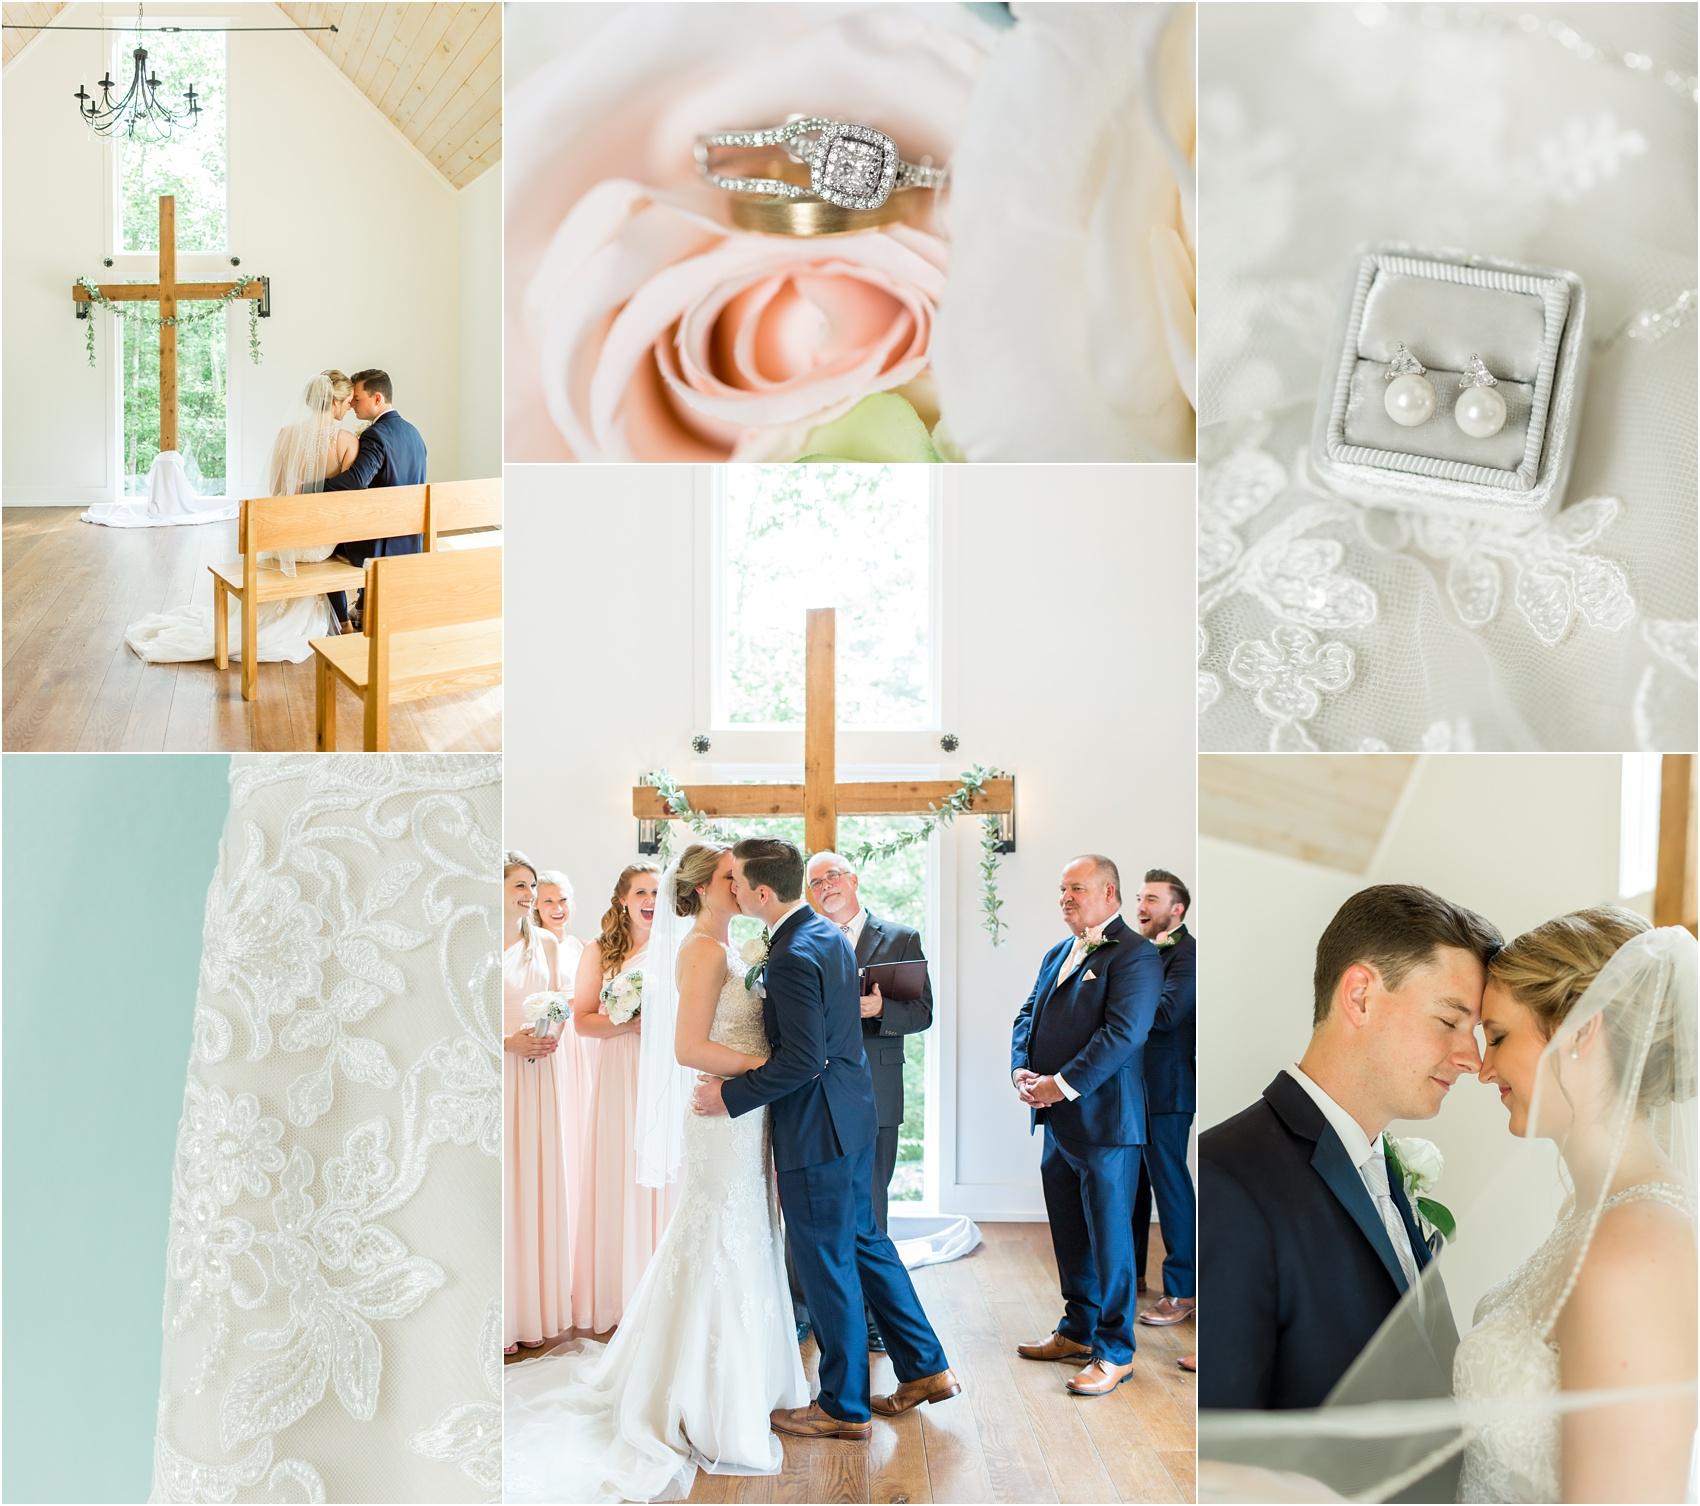 Savannah Eve Photography- Roper-Powell Wedding- Blog-54.jpg